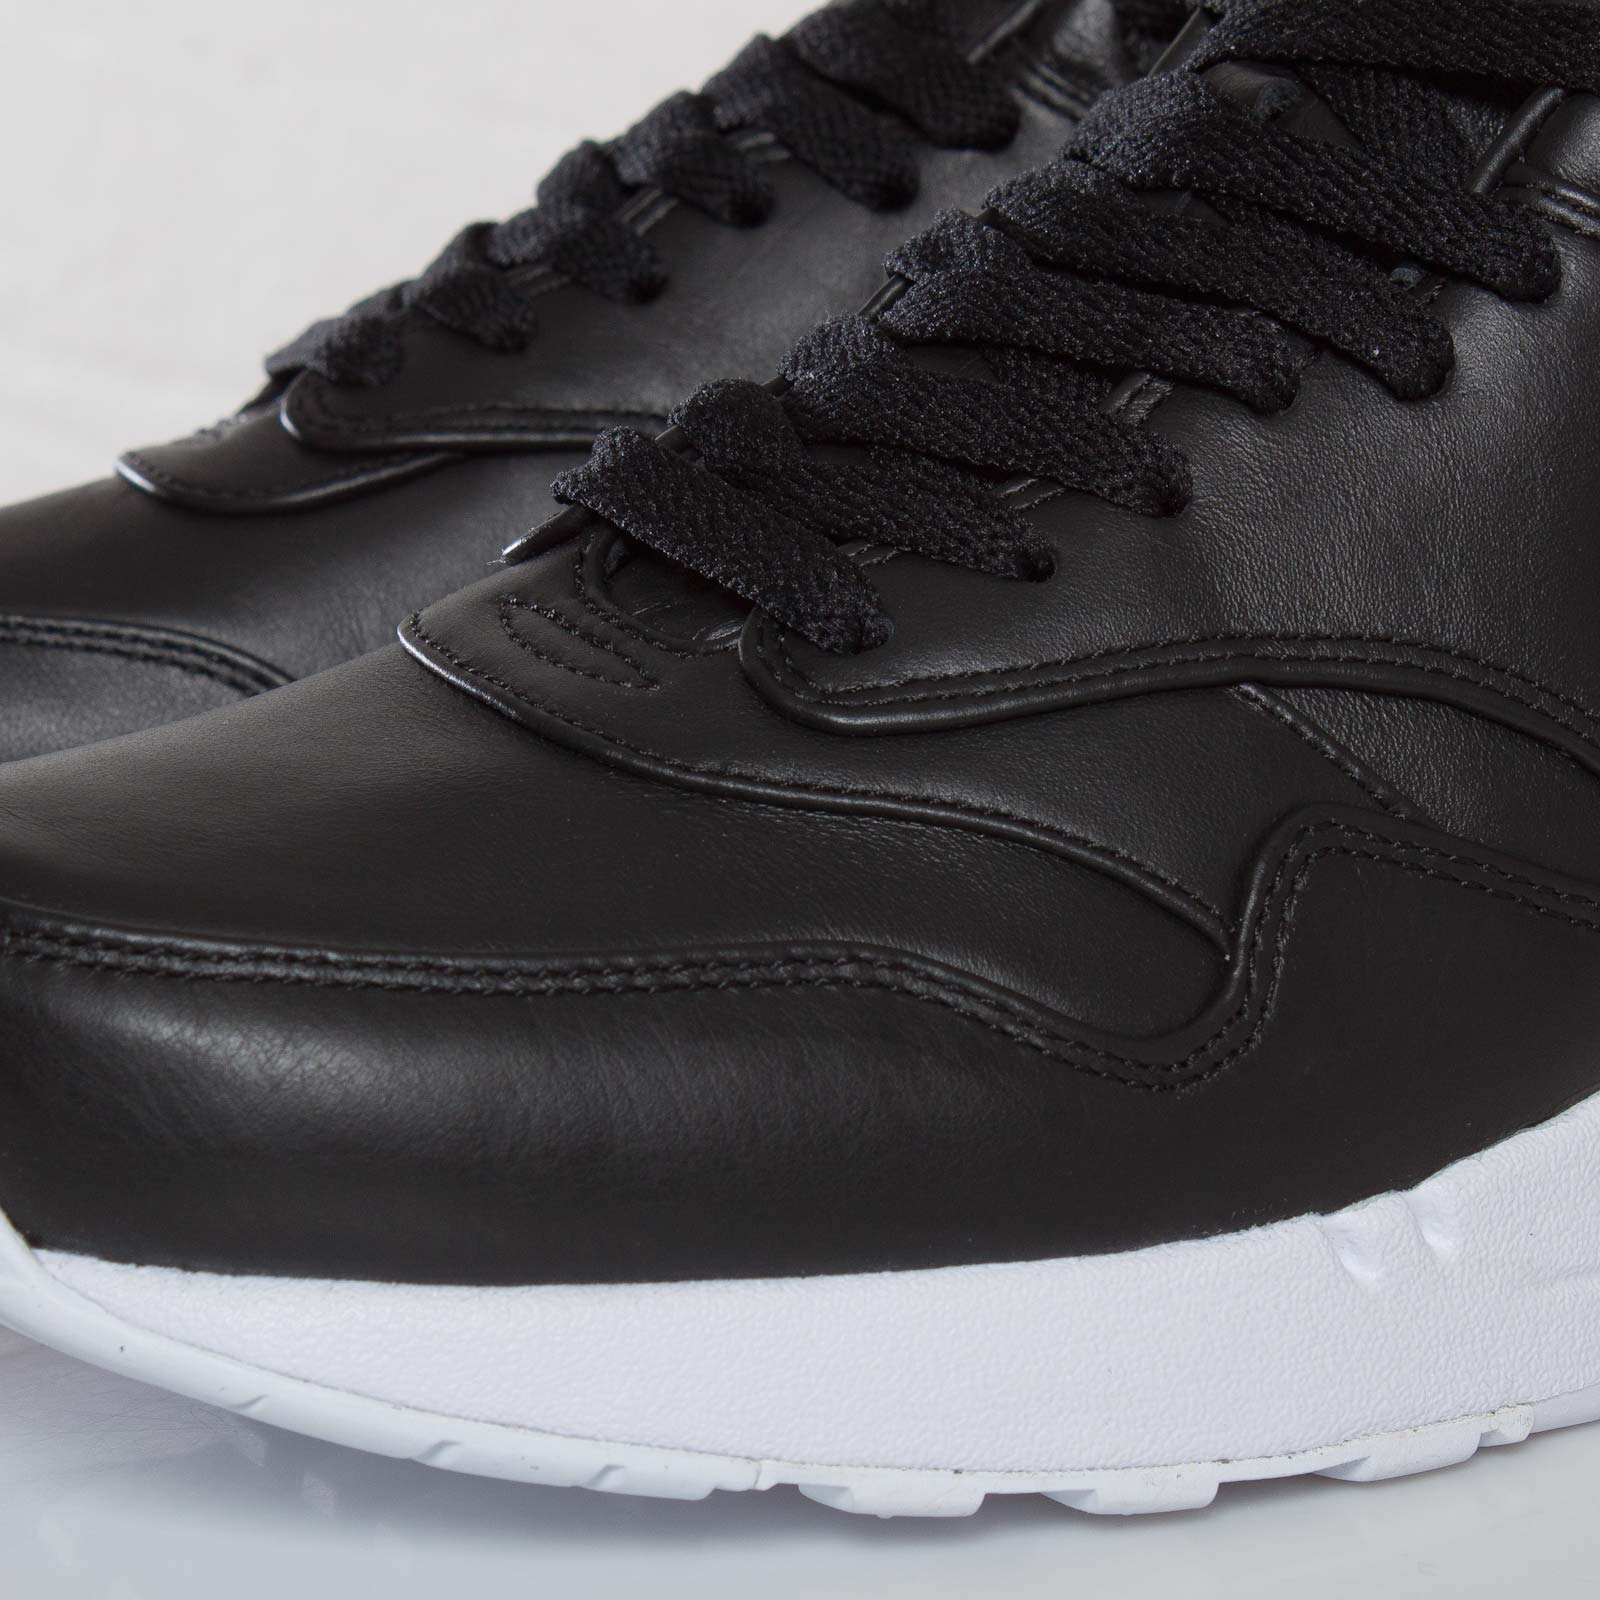 on sale b4001 99984 Nike Air Maxim 1 SP - 603546-001 - Sneakersnstuff   sneakers   streetwear  online since 1999